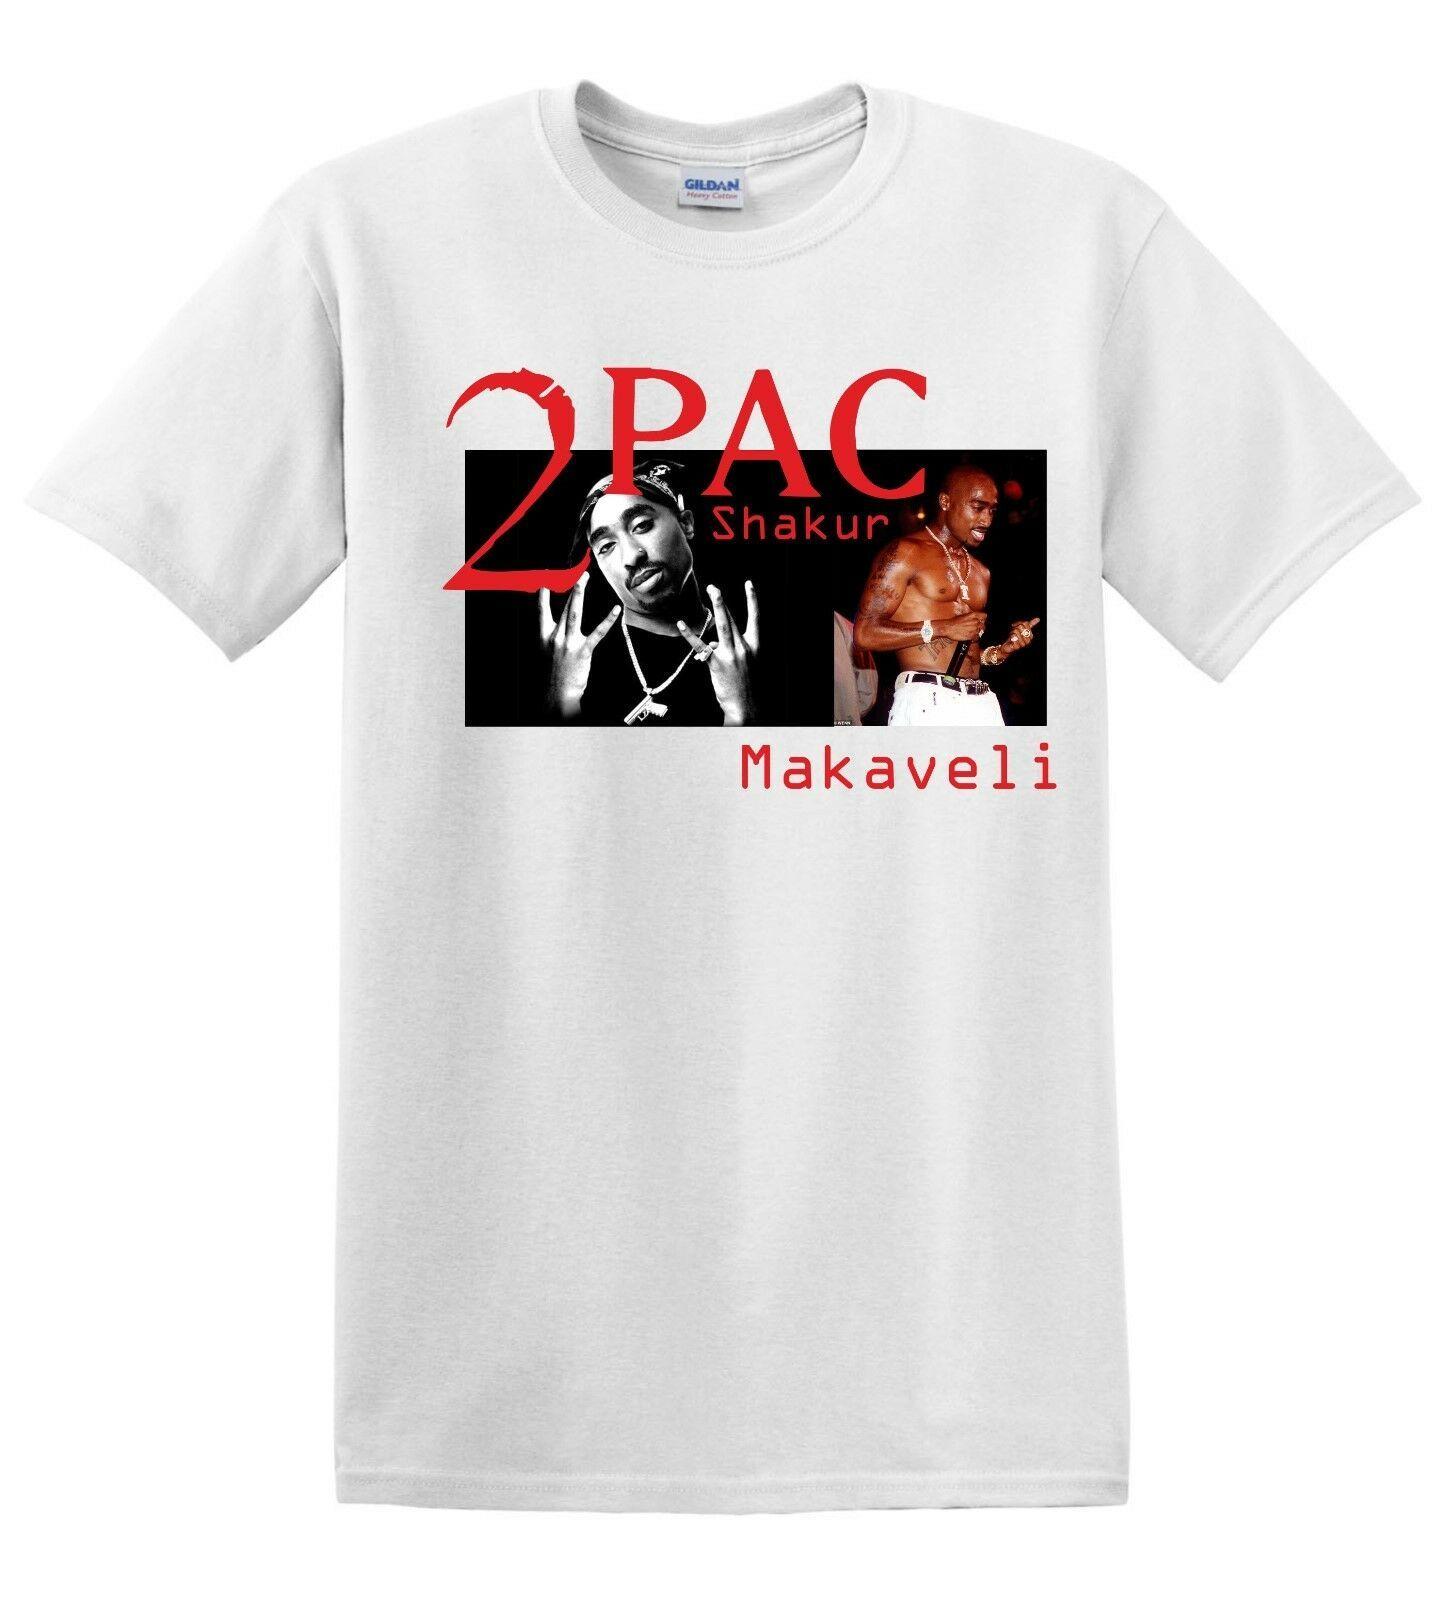 88141f3a 2PAC Tupac Shakur Hip Hop Rap Unisex T Shirt Free Delivery Men Women Unisex  Fashion Tshirt Black Buy Tee Shirts Great Tee Shirts From  Designprinttshirts02, ...